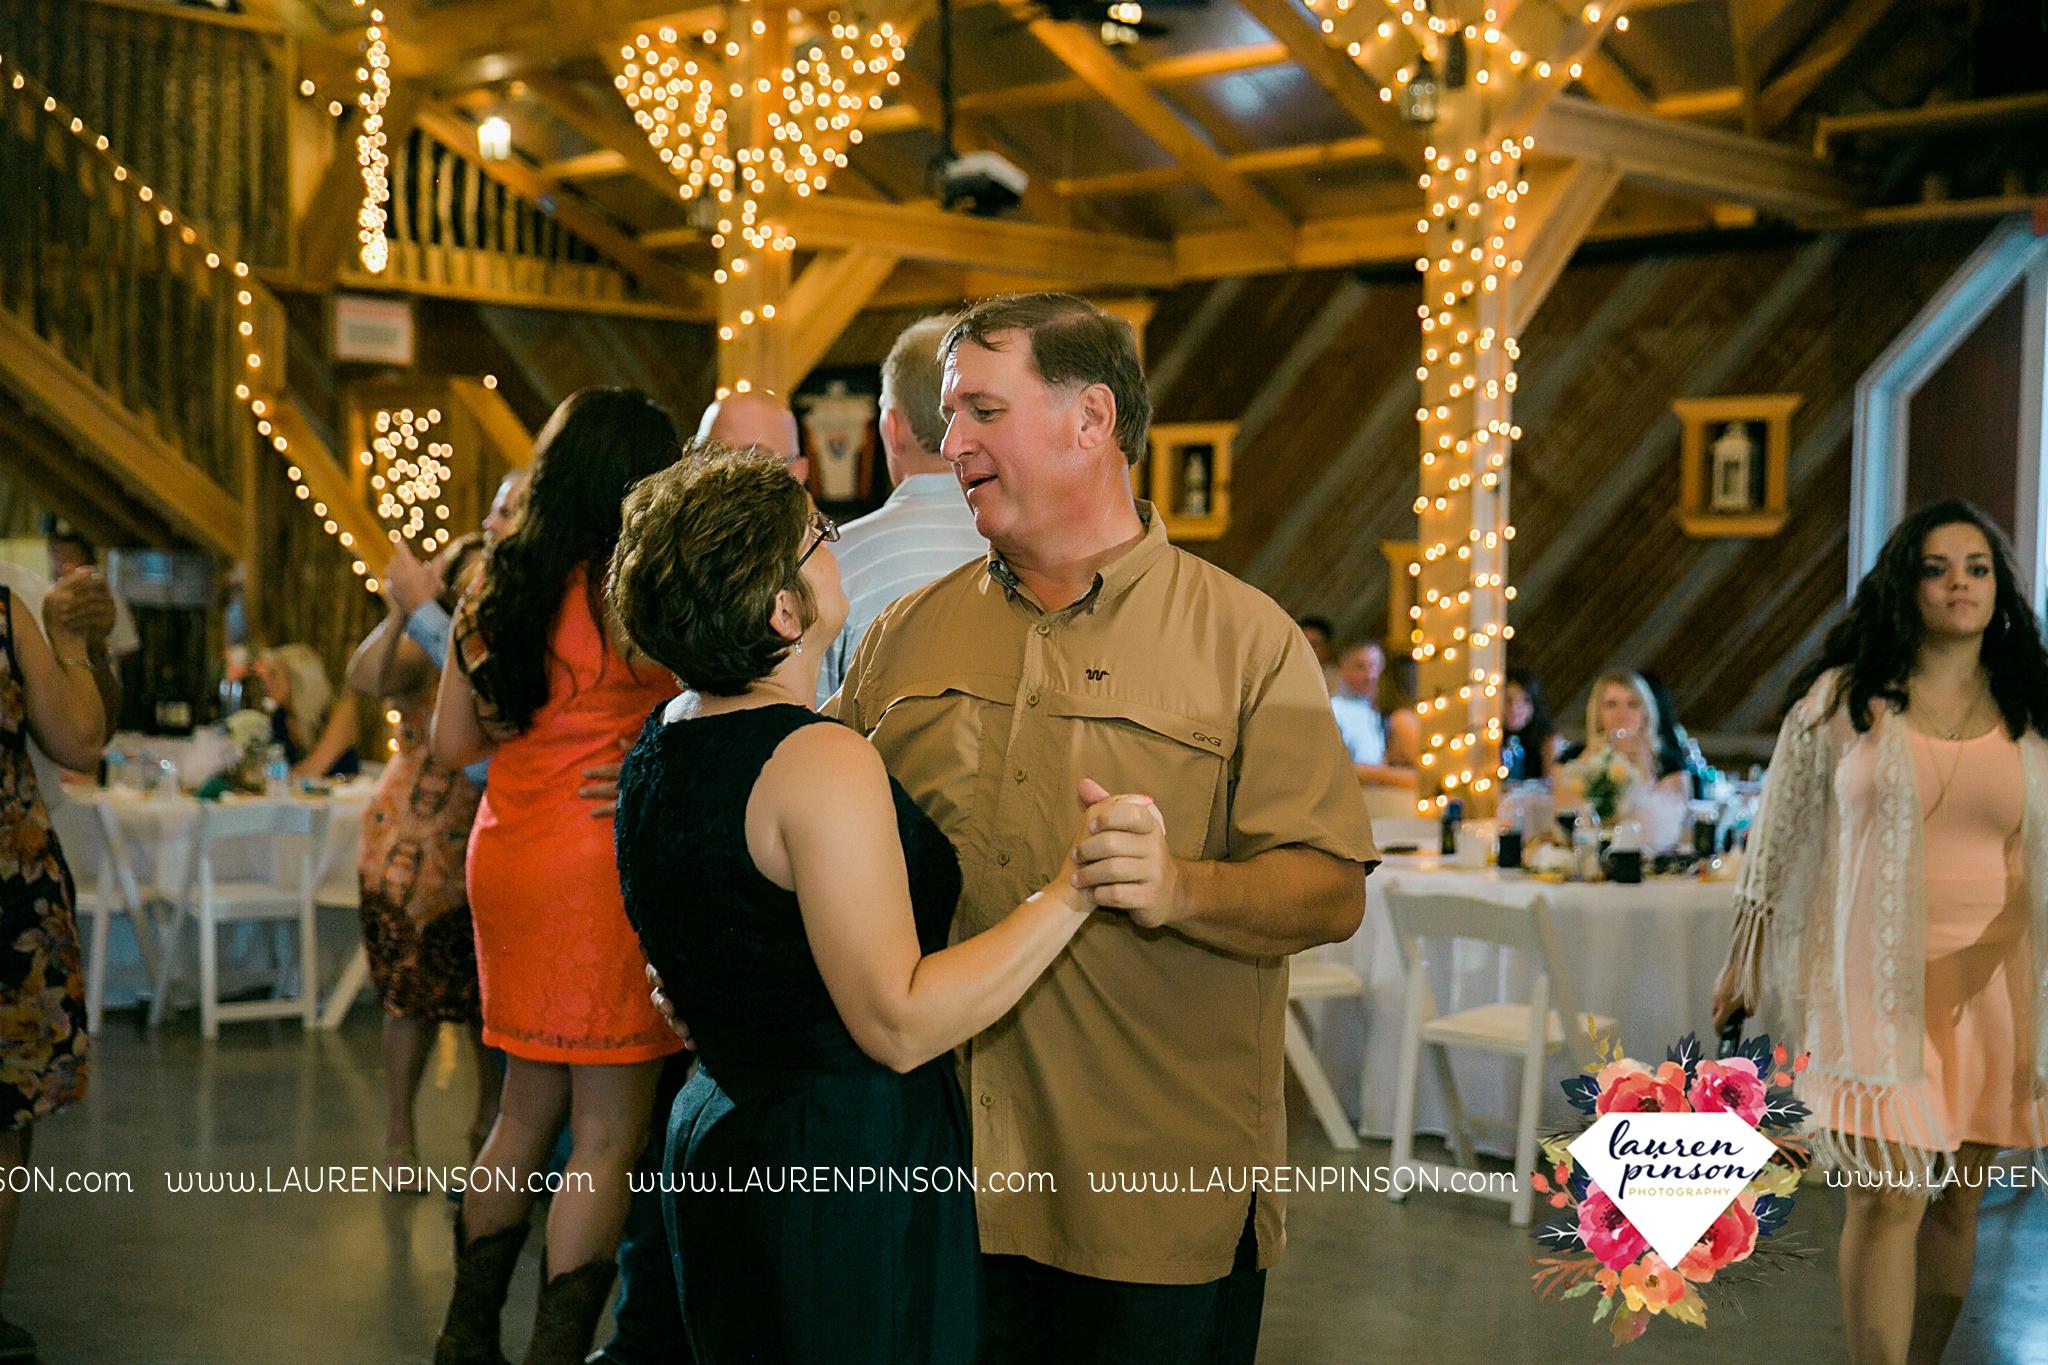 jones-barn-willow-creek-ranch-wedding-in-cleburne-texas-fort-worth-dfw-wichita-falls-wedding-photography_3264.jpg